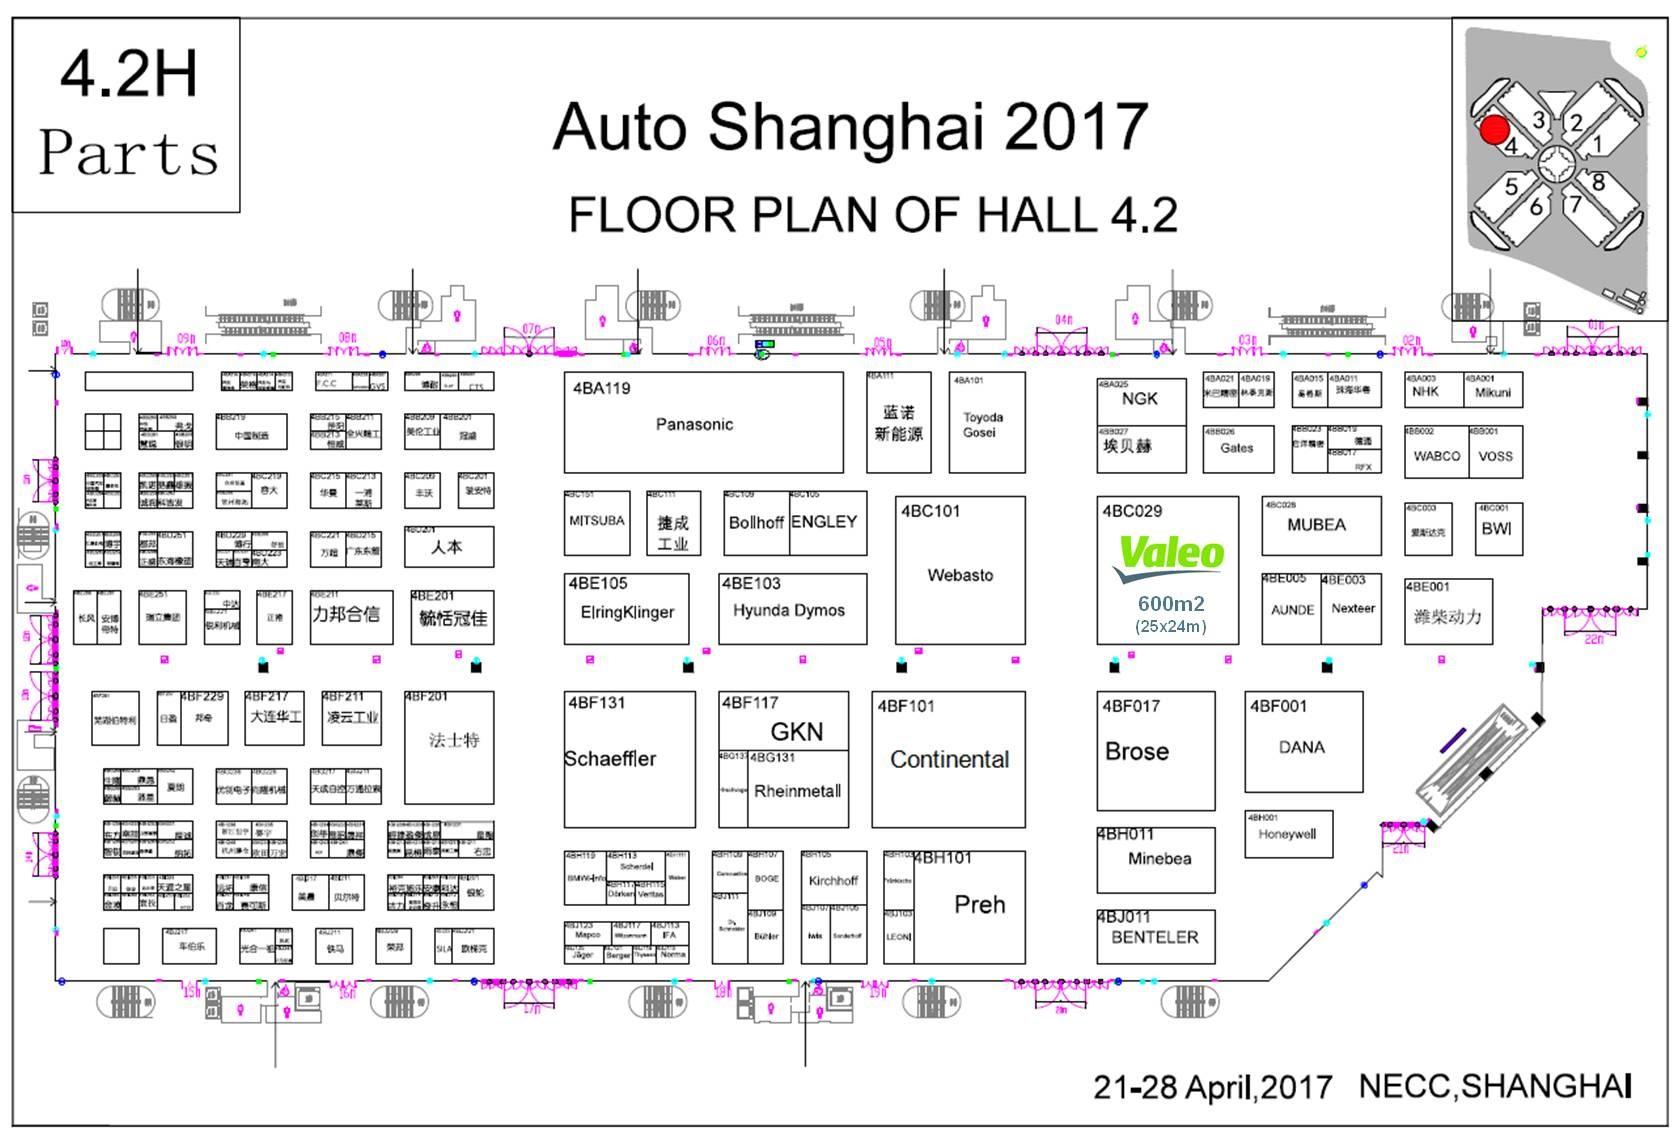 diapo_press-release_map_auto-shanghai_Floor plan 4.2 NECC